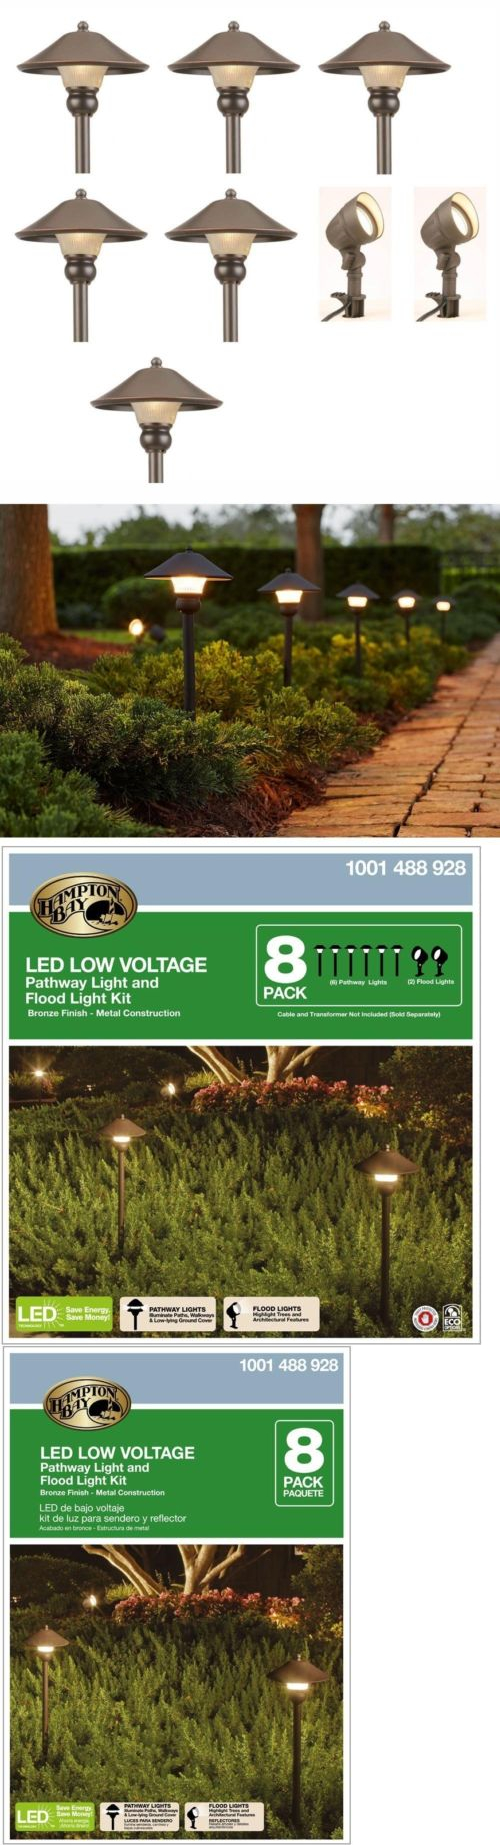 Landscape And Walkway Lights 94940 Outdoor Led Light Kit Low Voltage Path Lighting Garden Walkway